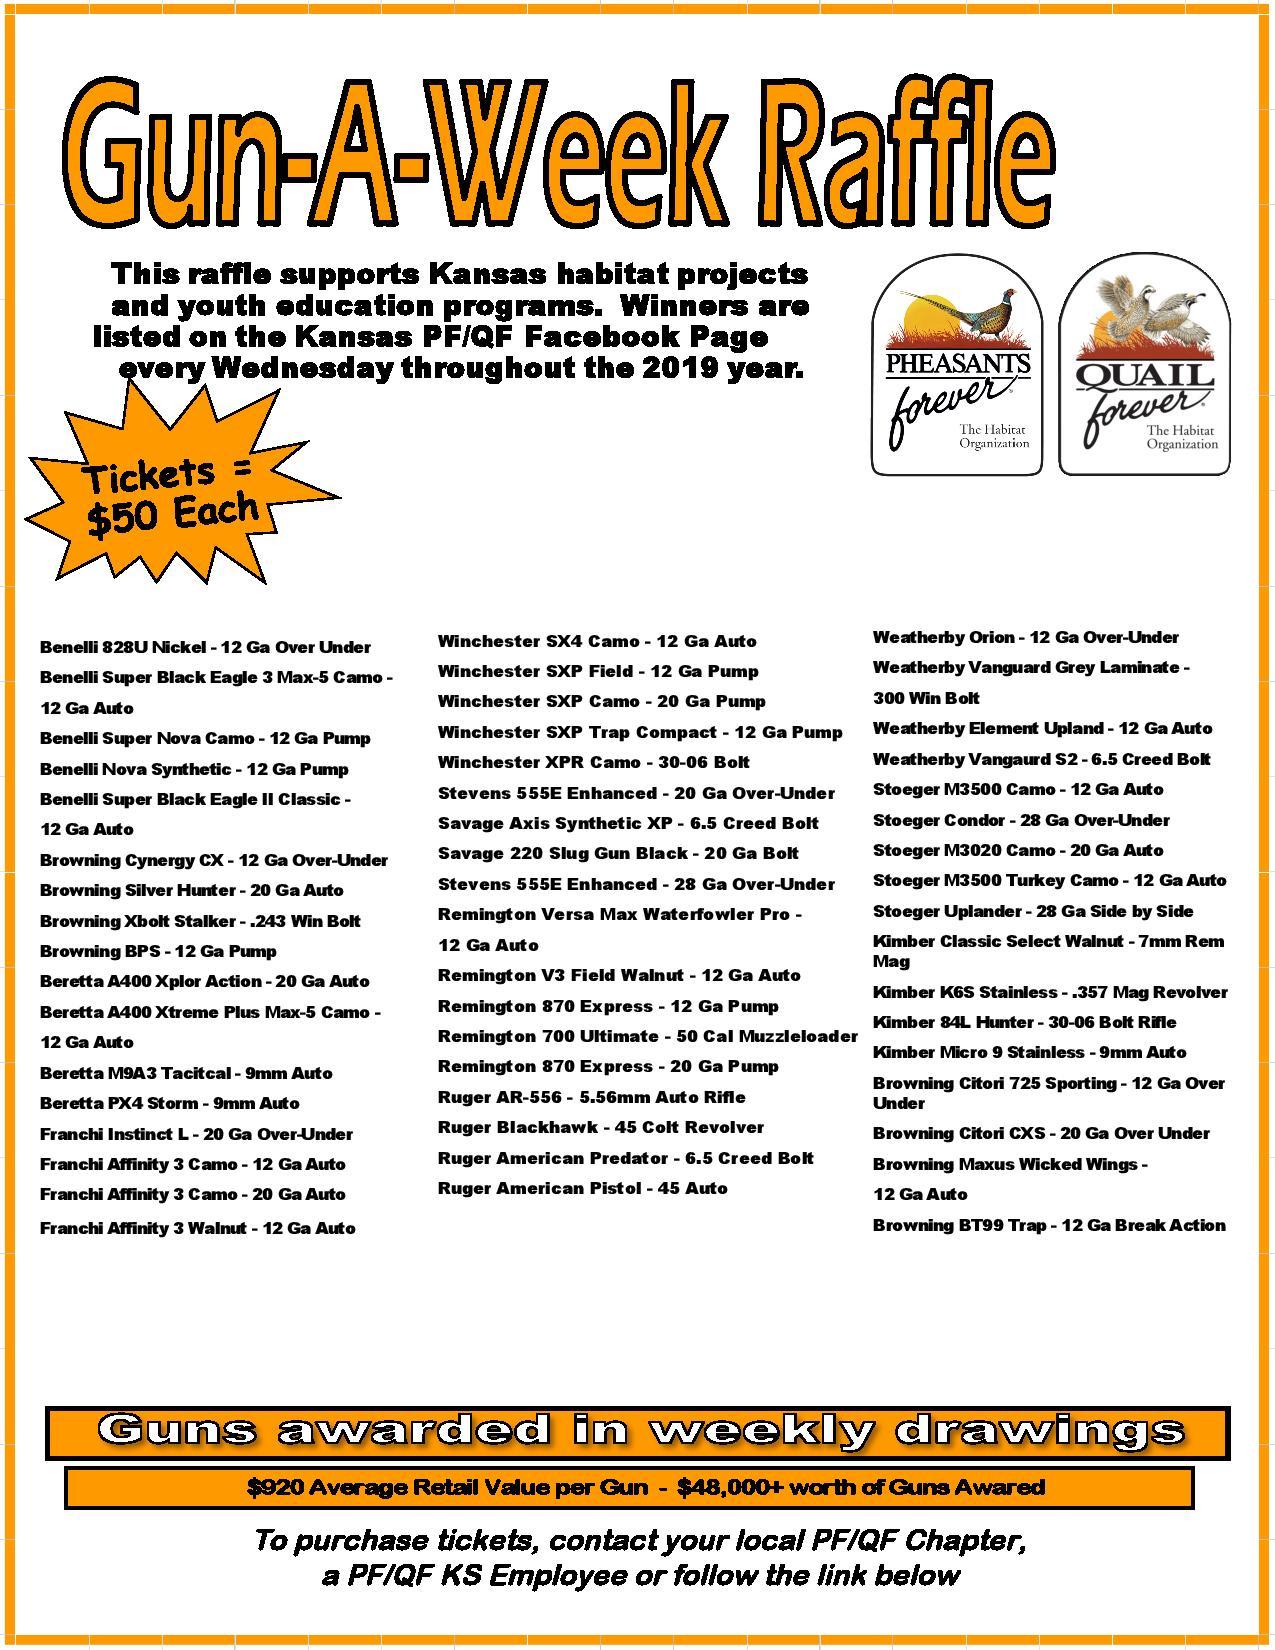 Gun-A-Week Raffle Flyer.jpg